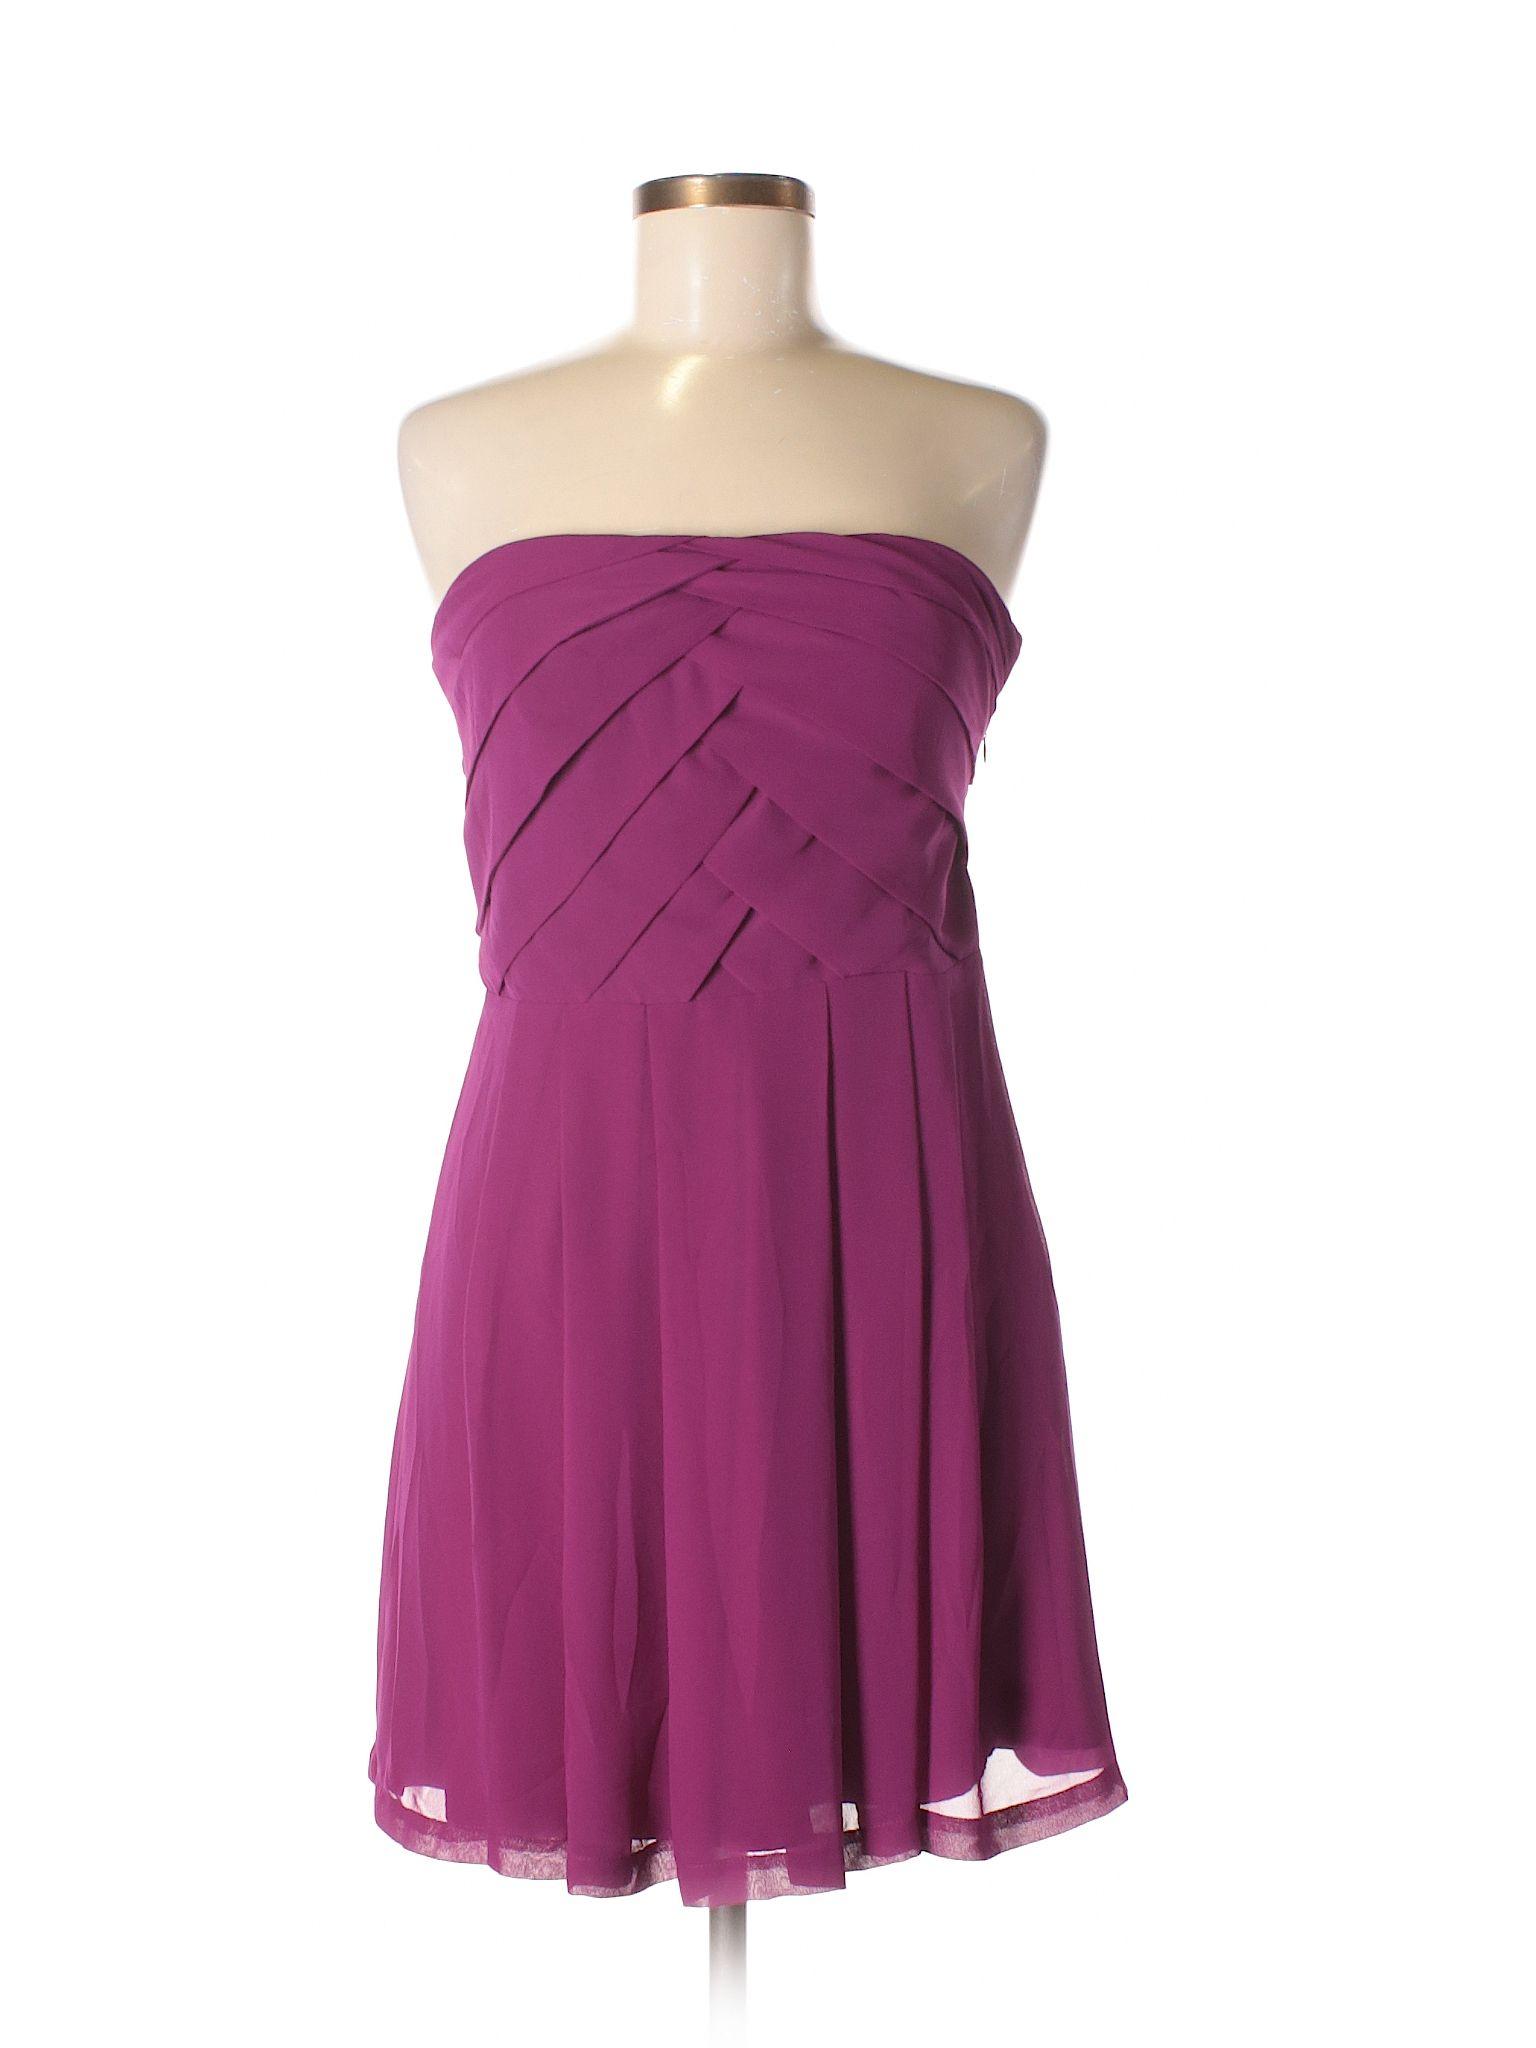 Express Cocktail Dress: Size 6.00 Dark Purple Women\'s Dresses ...